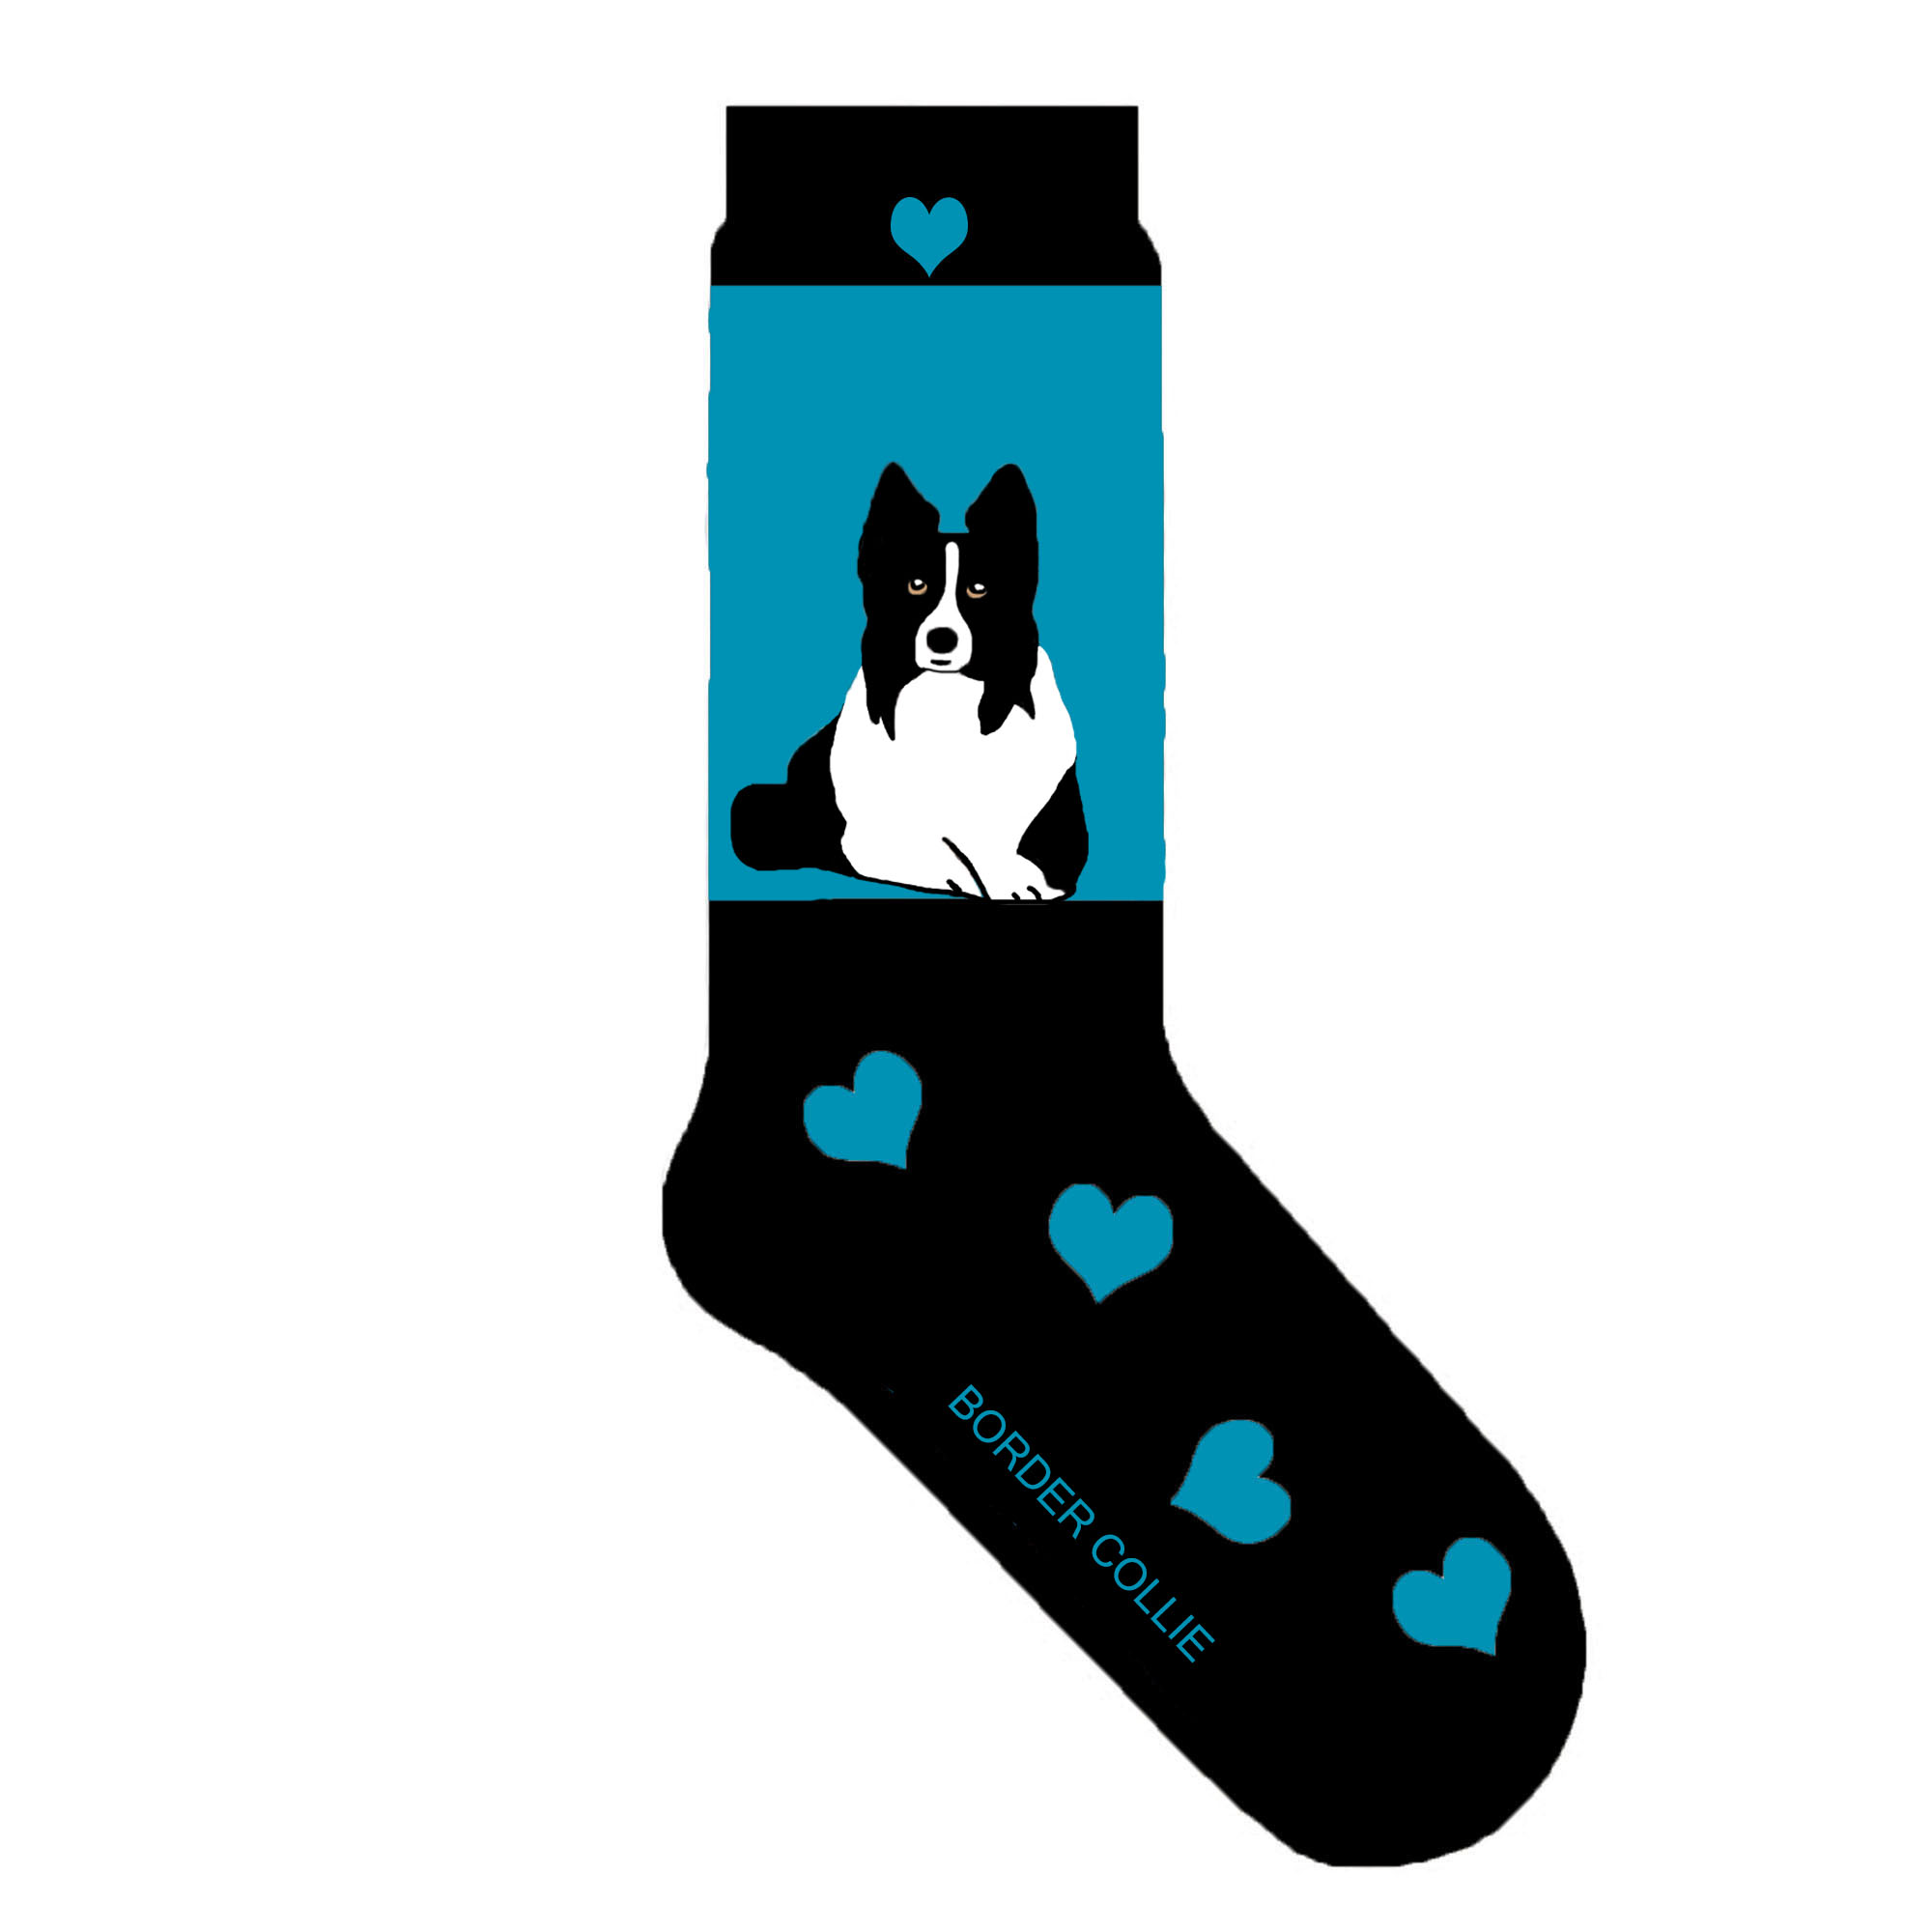 Border Collie Hoodie Hoody Hoodie Funny Cool Puppy Paw Love Unisex Dog Cute Pup